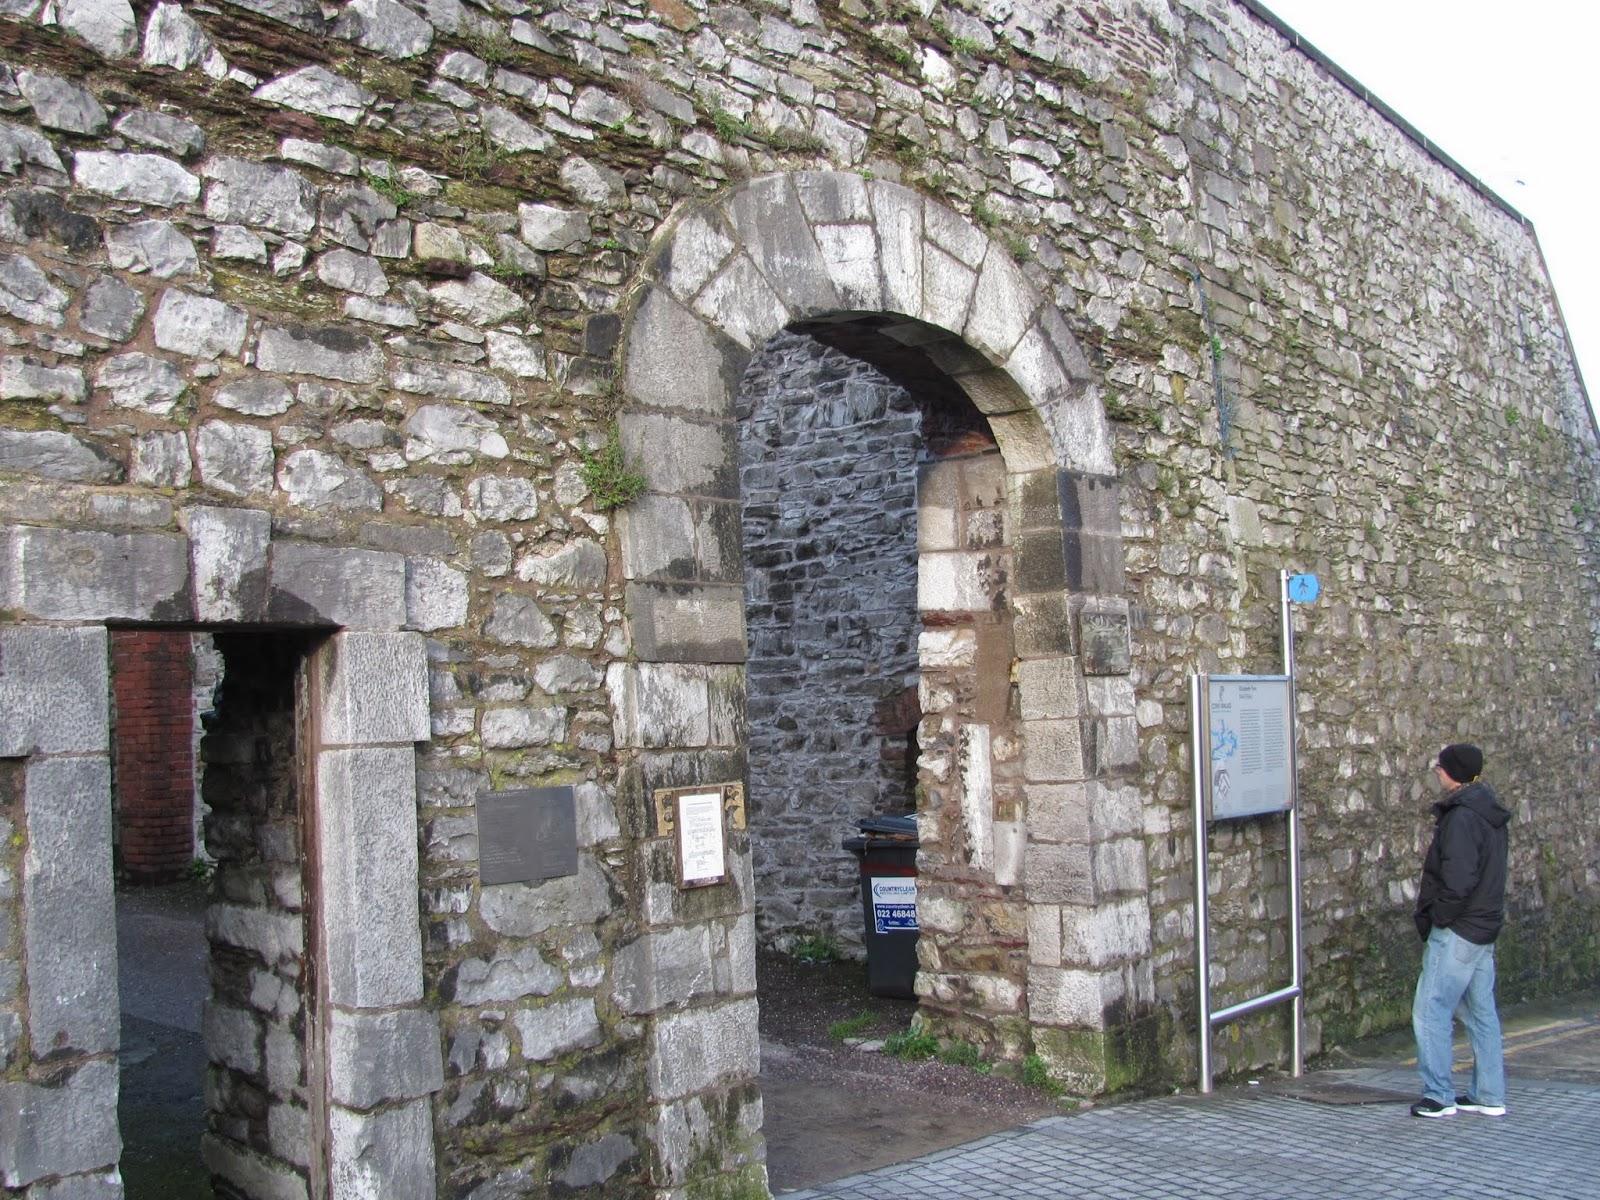 Cory at Elizabeth Fort Cork, Ireland